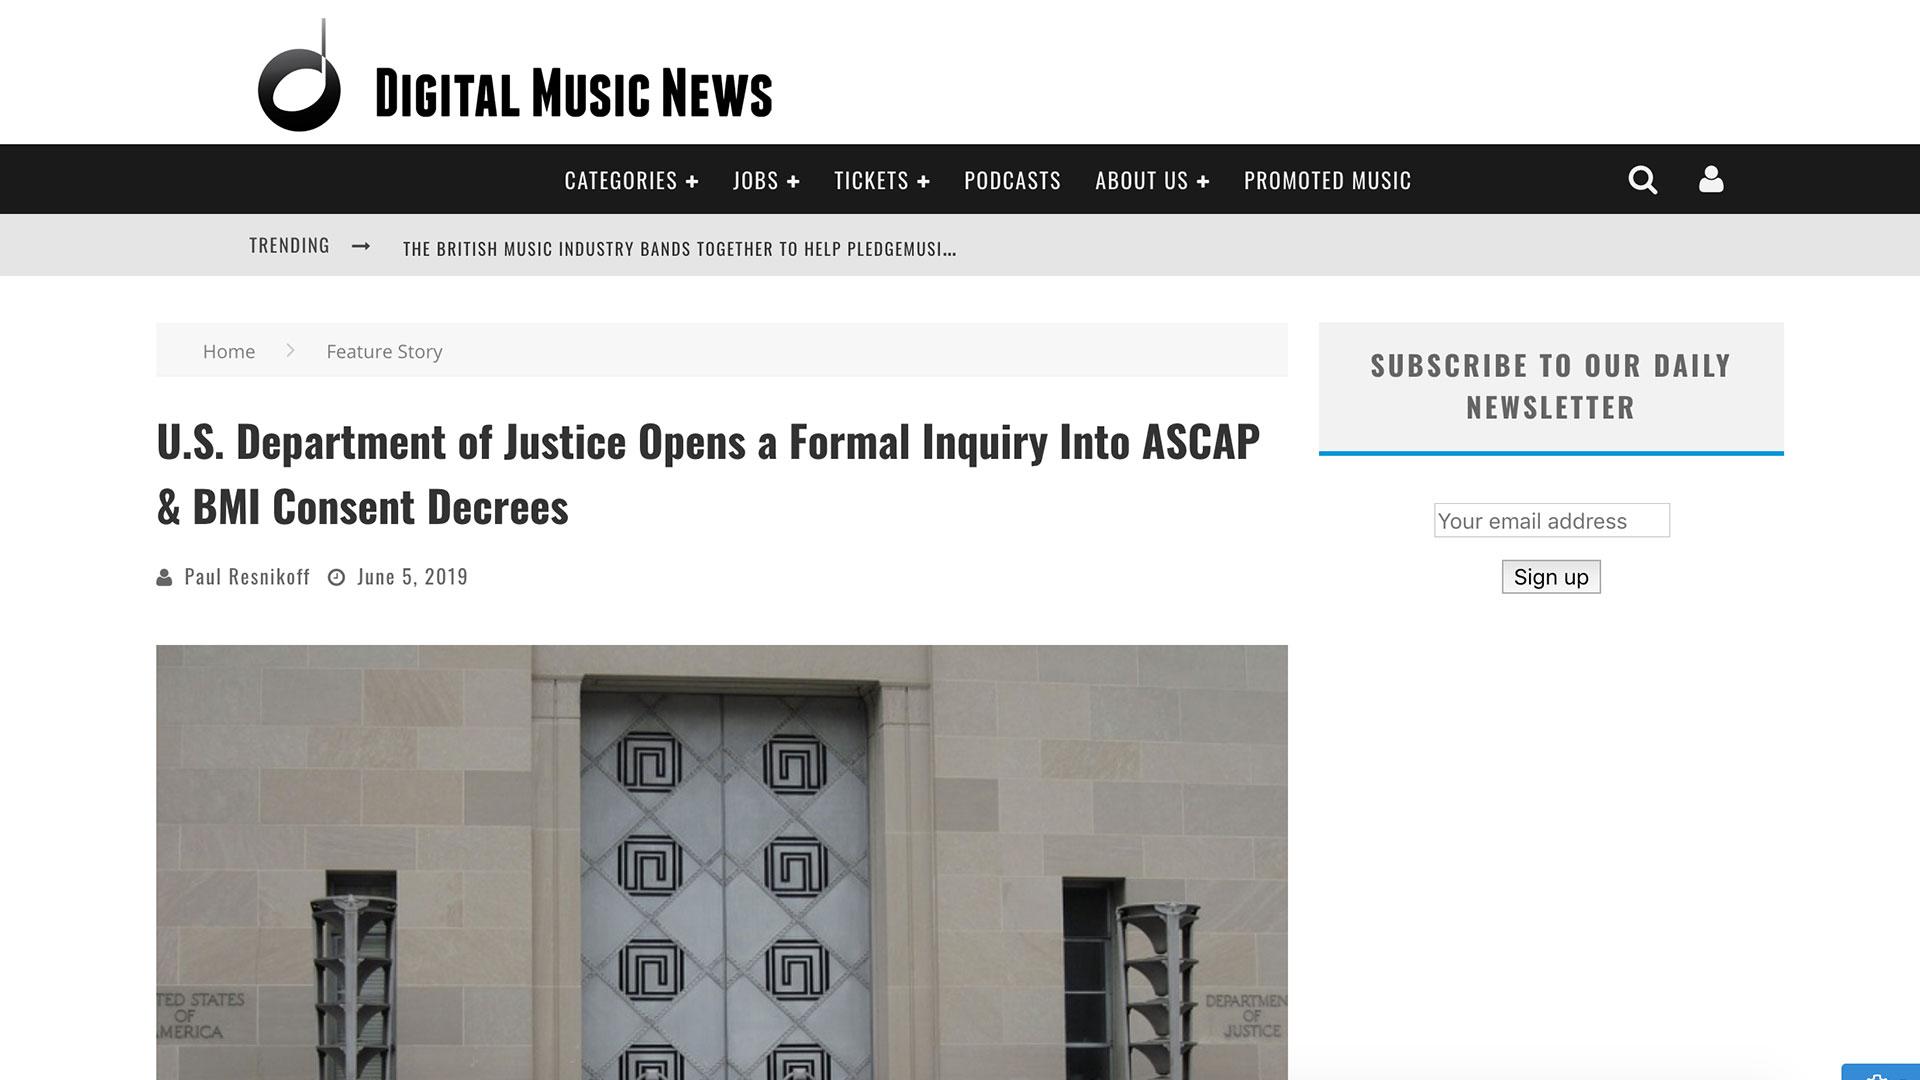 Fairness Rocks News U.S. Department of Justice Opens a Formal Inquiry Into ASCAP & BMI Consent Decrees